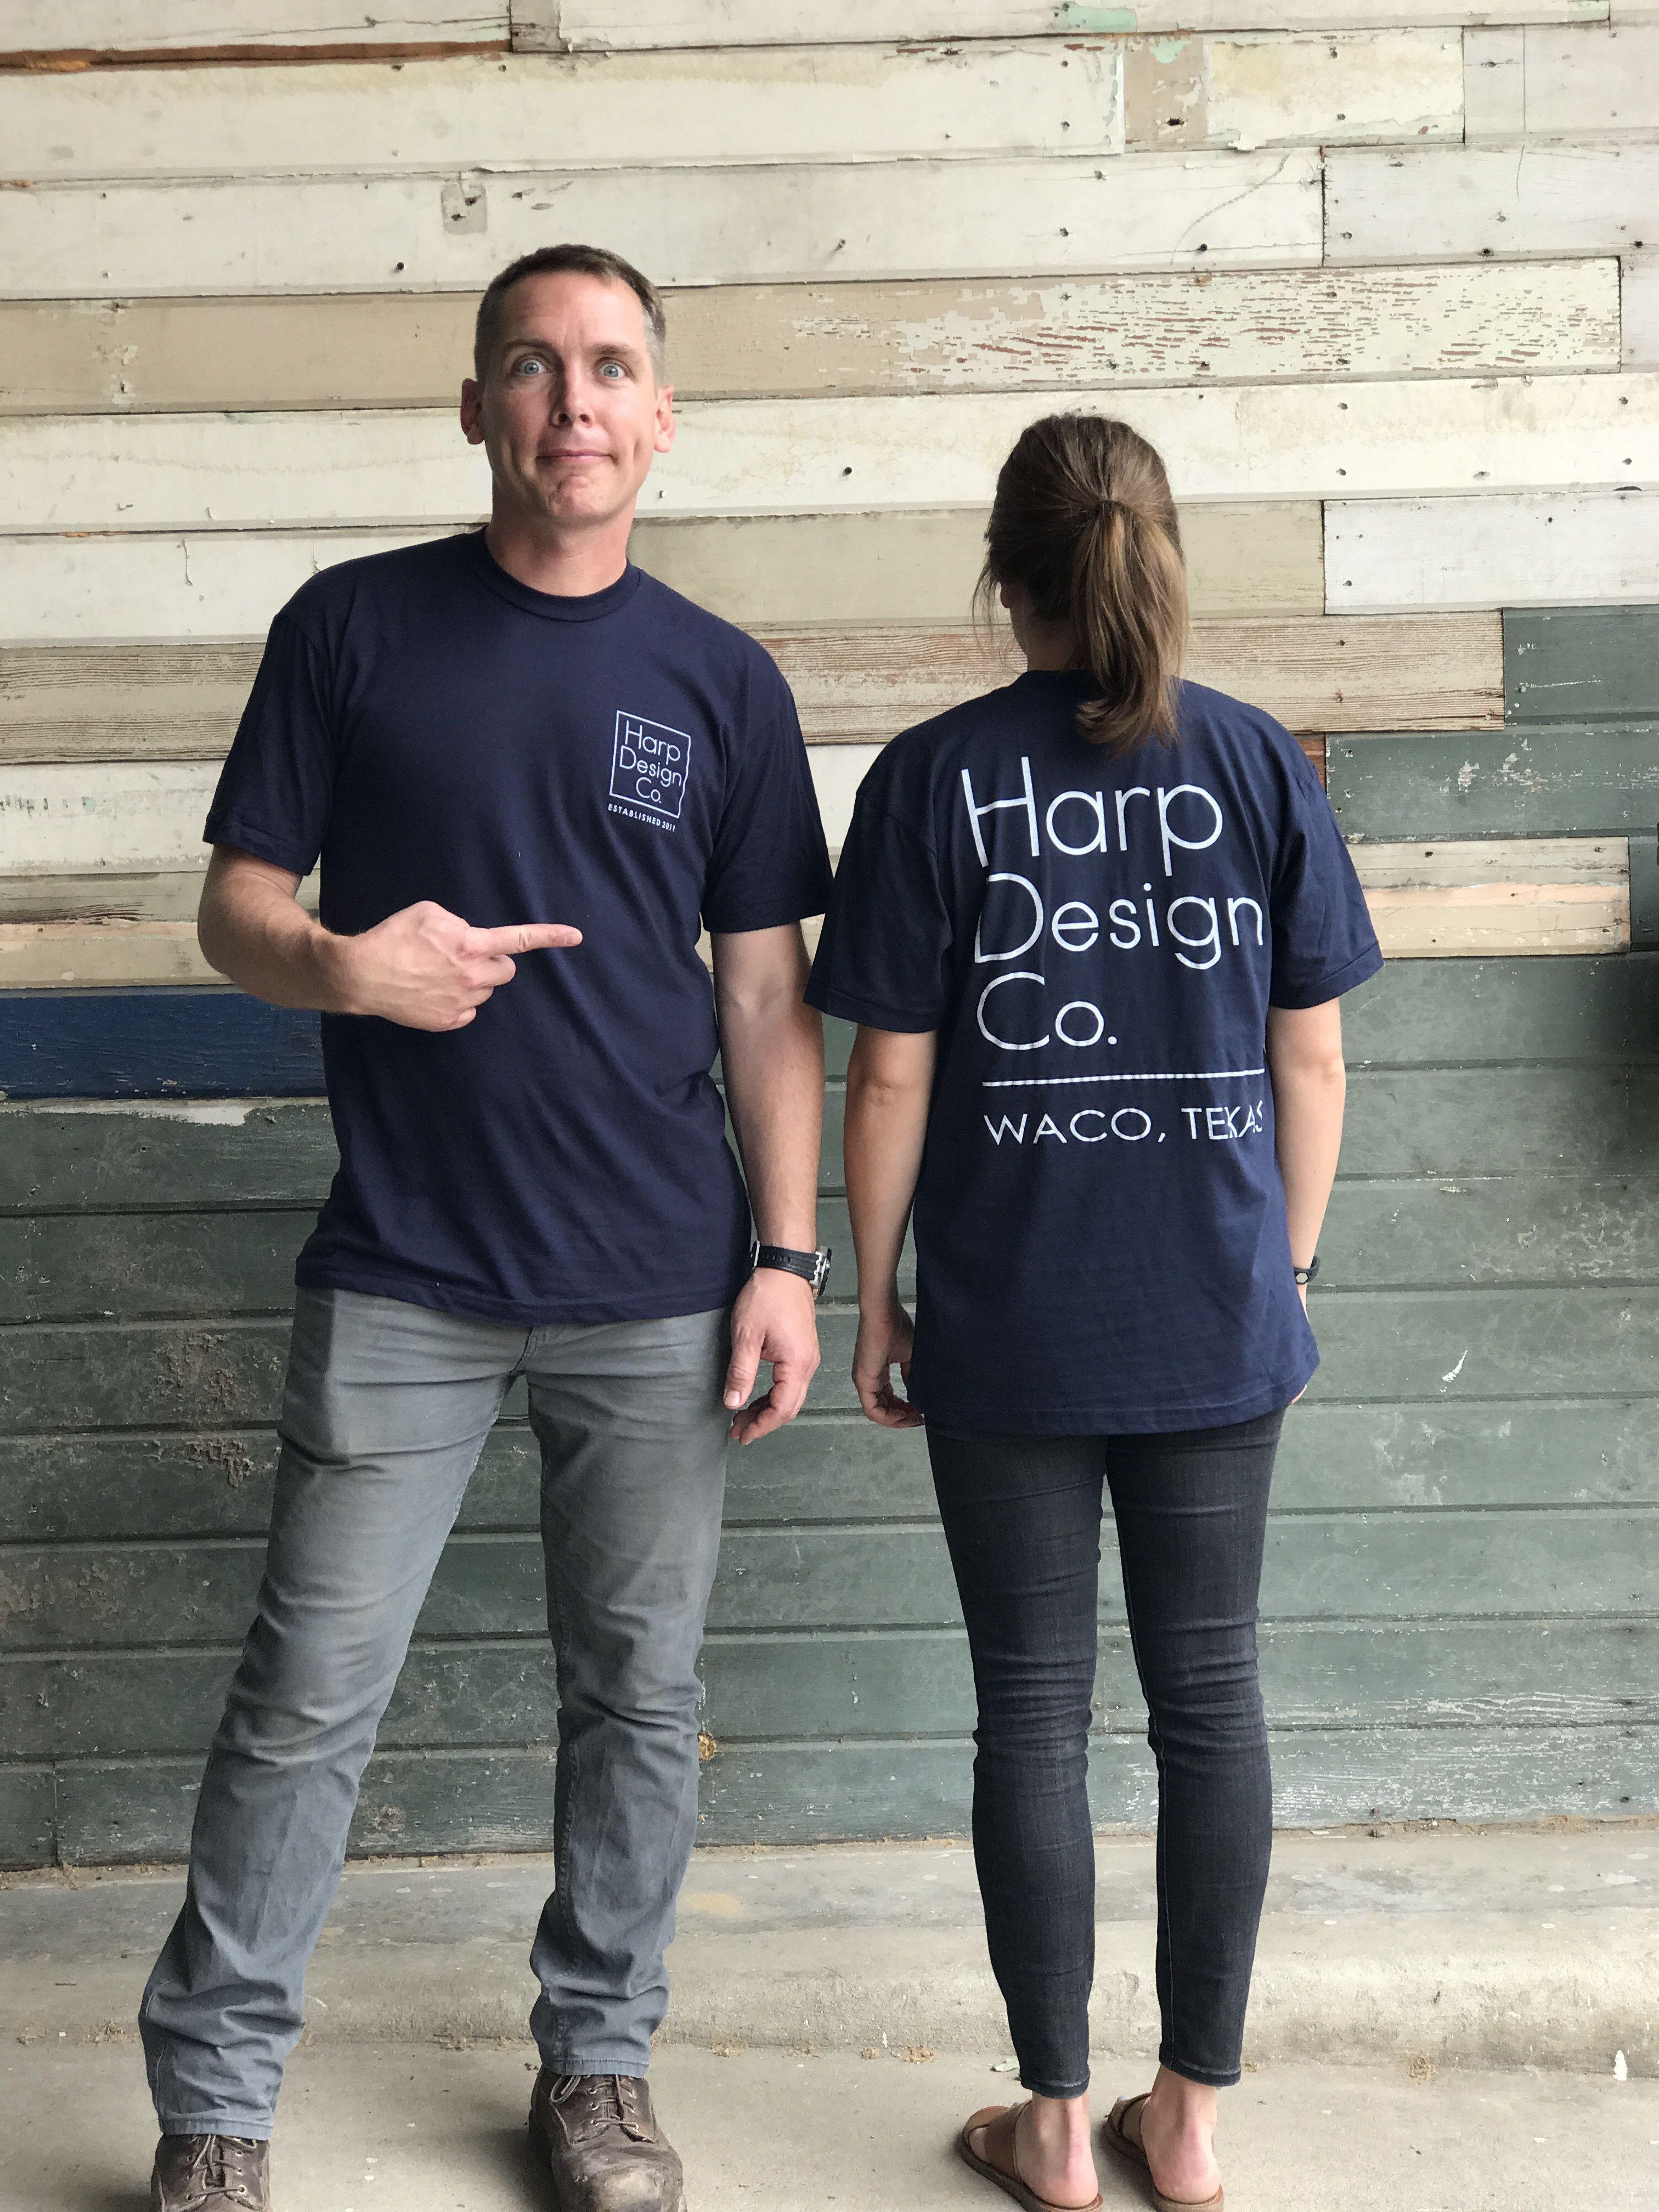 T Shirt Navy Blue Clint Harp Joanna Gaines And Magnolia Fixer Upper